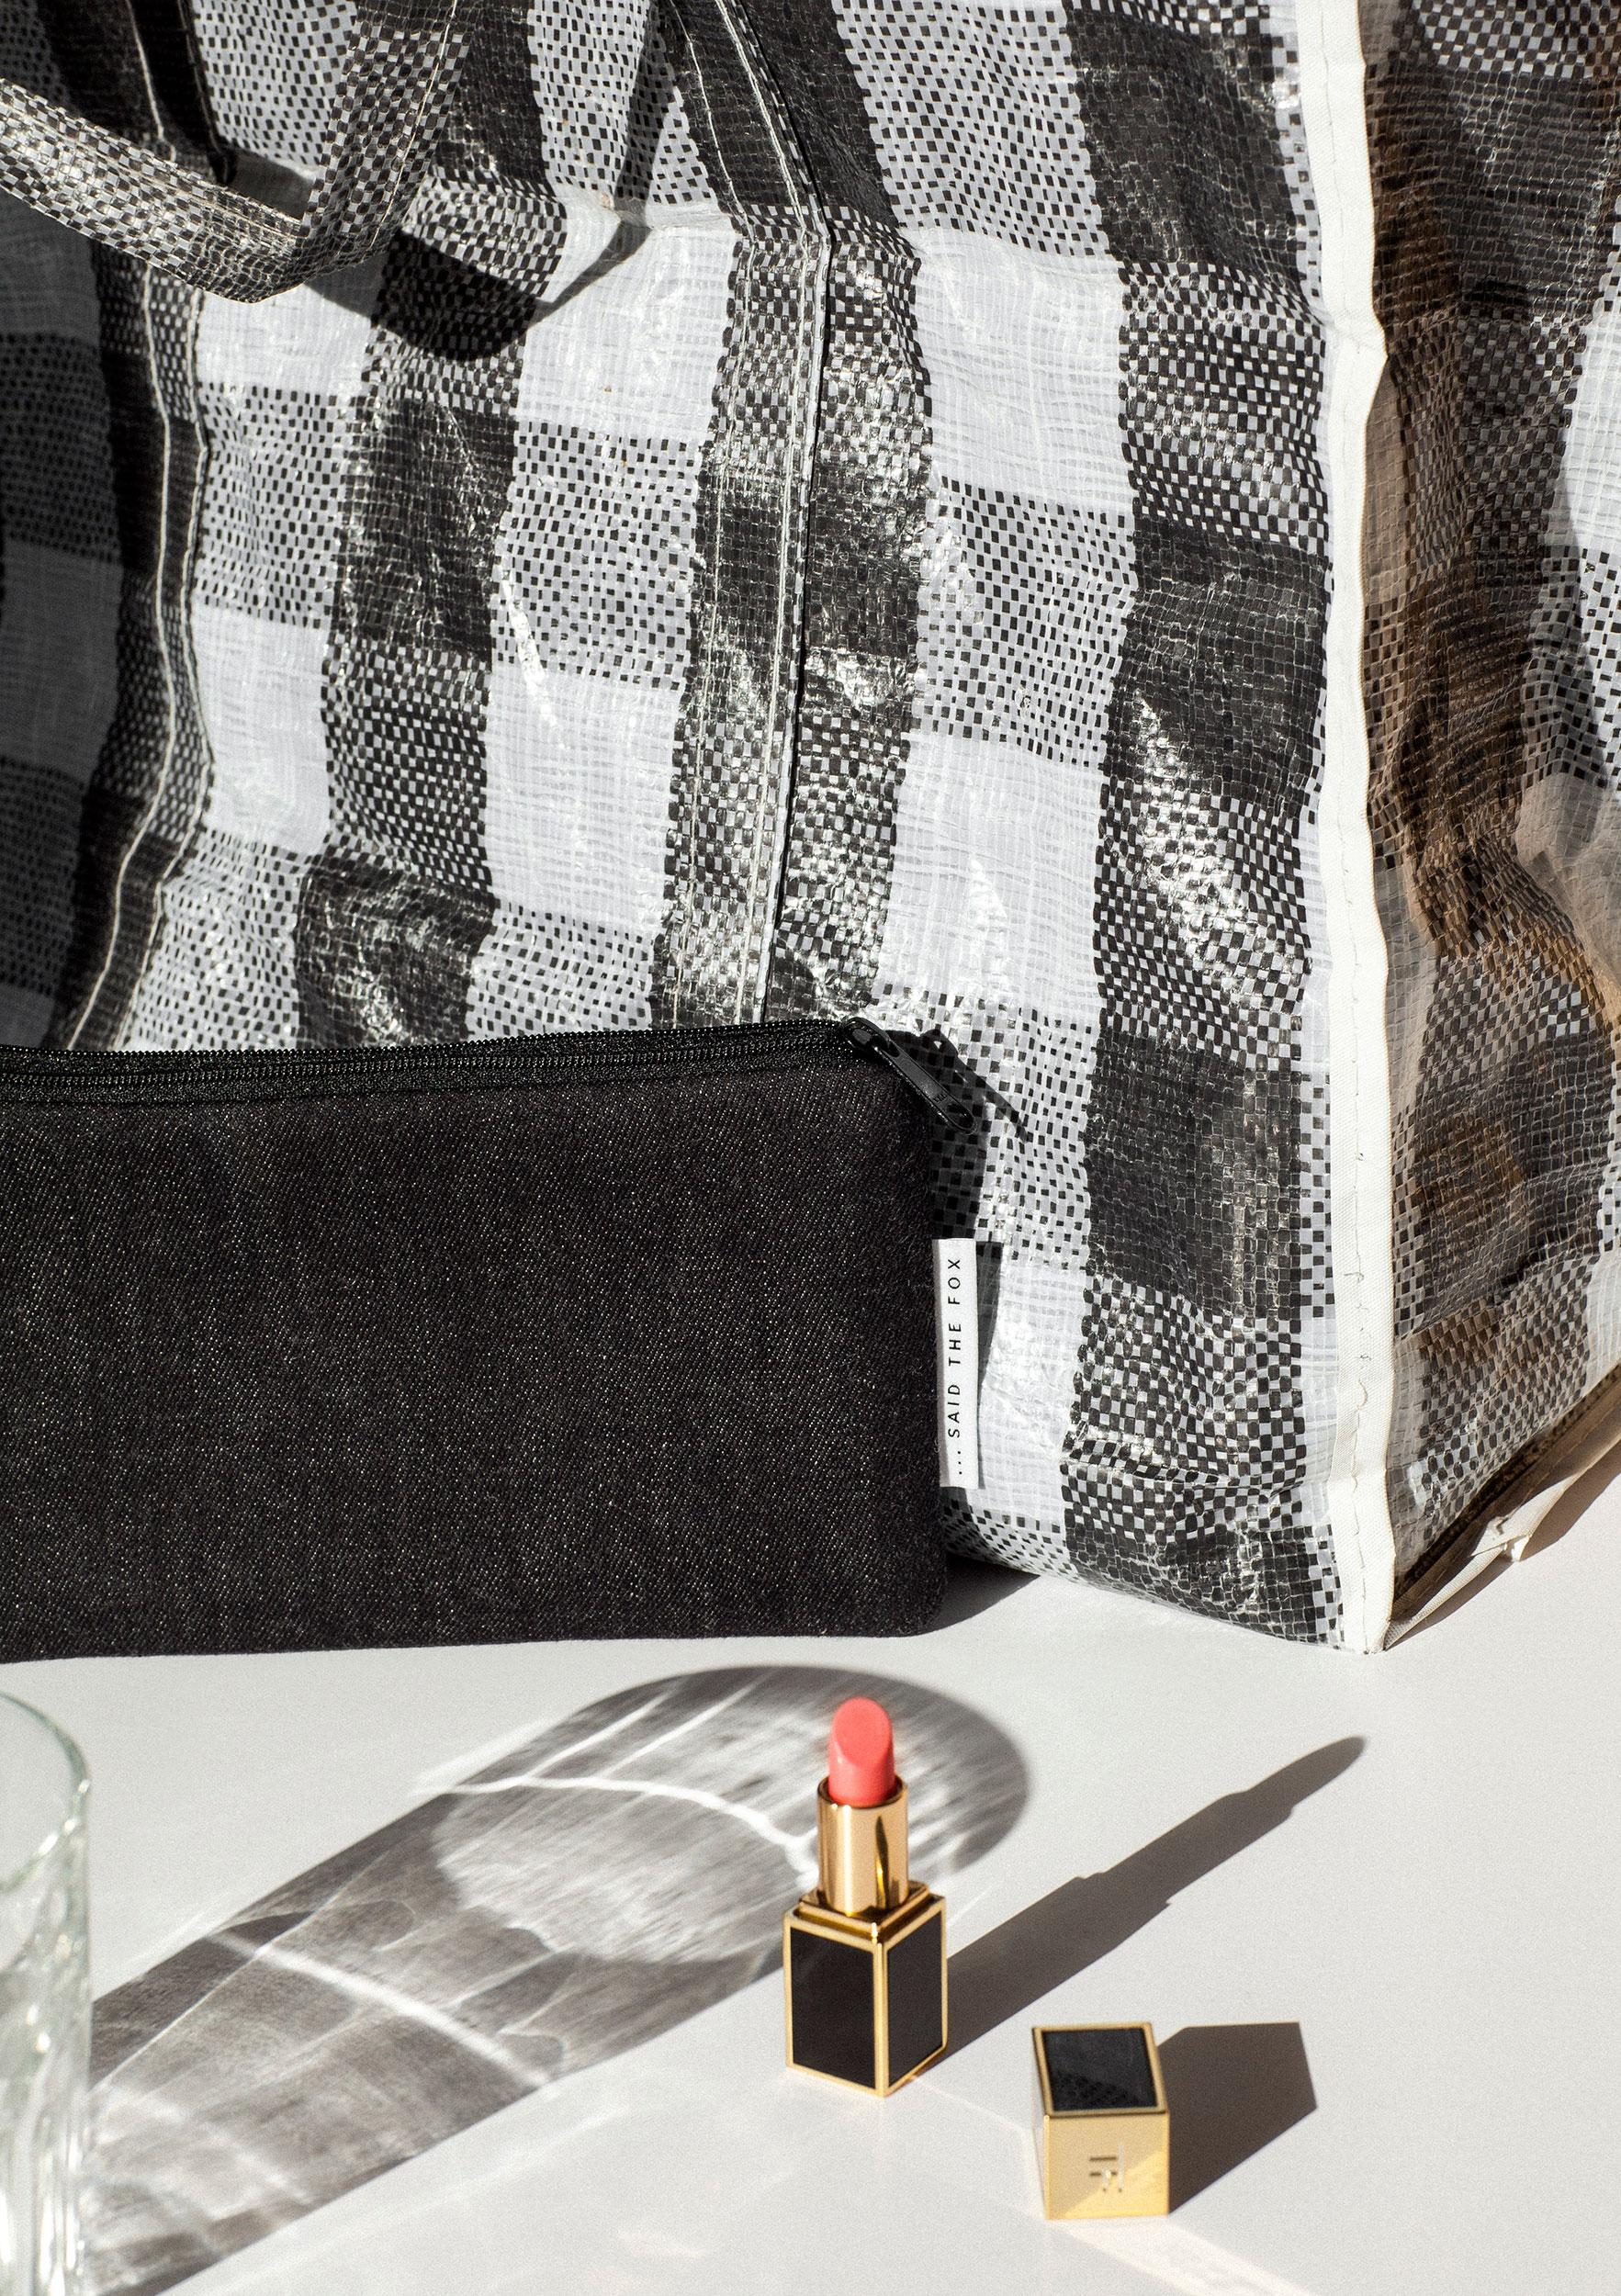 SAIDTHEFOX-lookbook-organiccotton-pouch